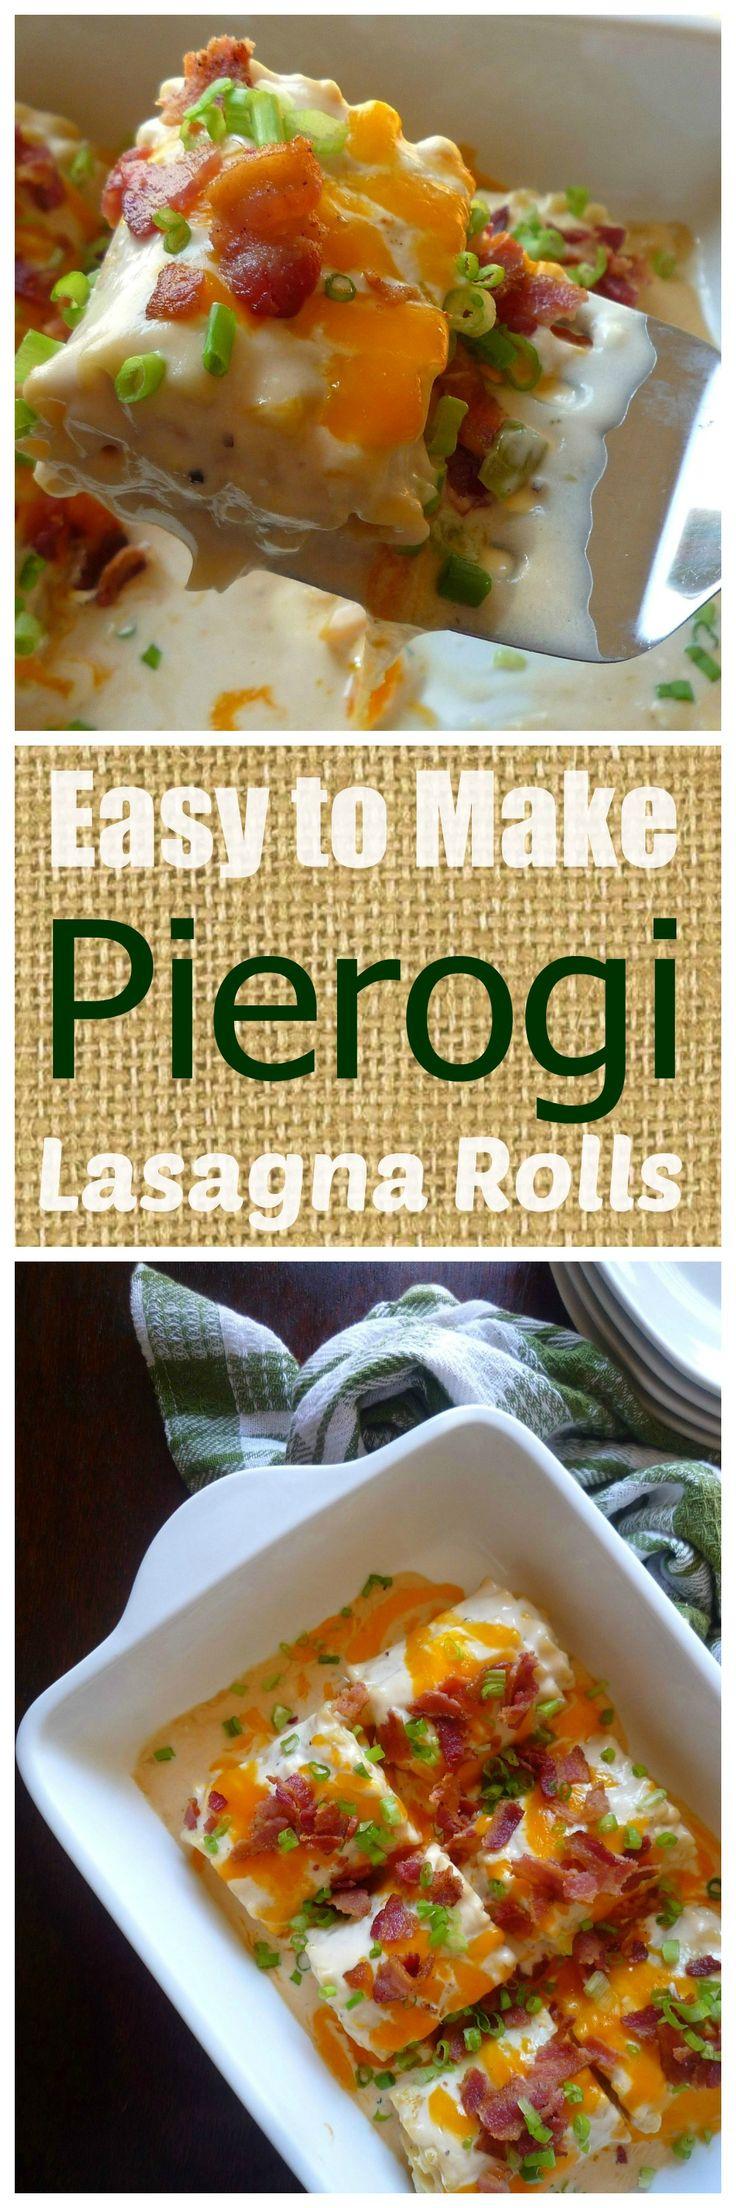 Easy to Make Pierogi Lasagna Rolls